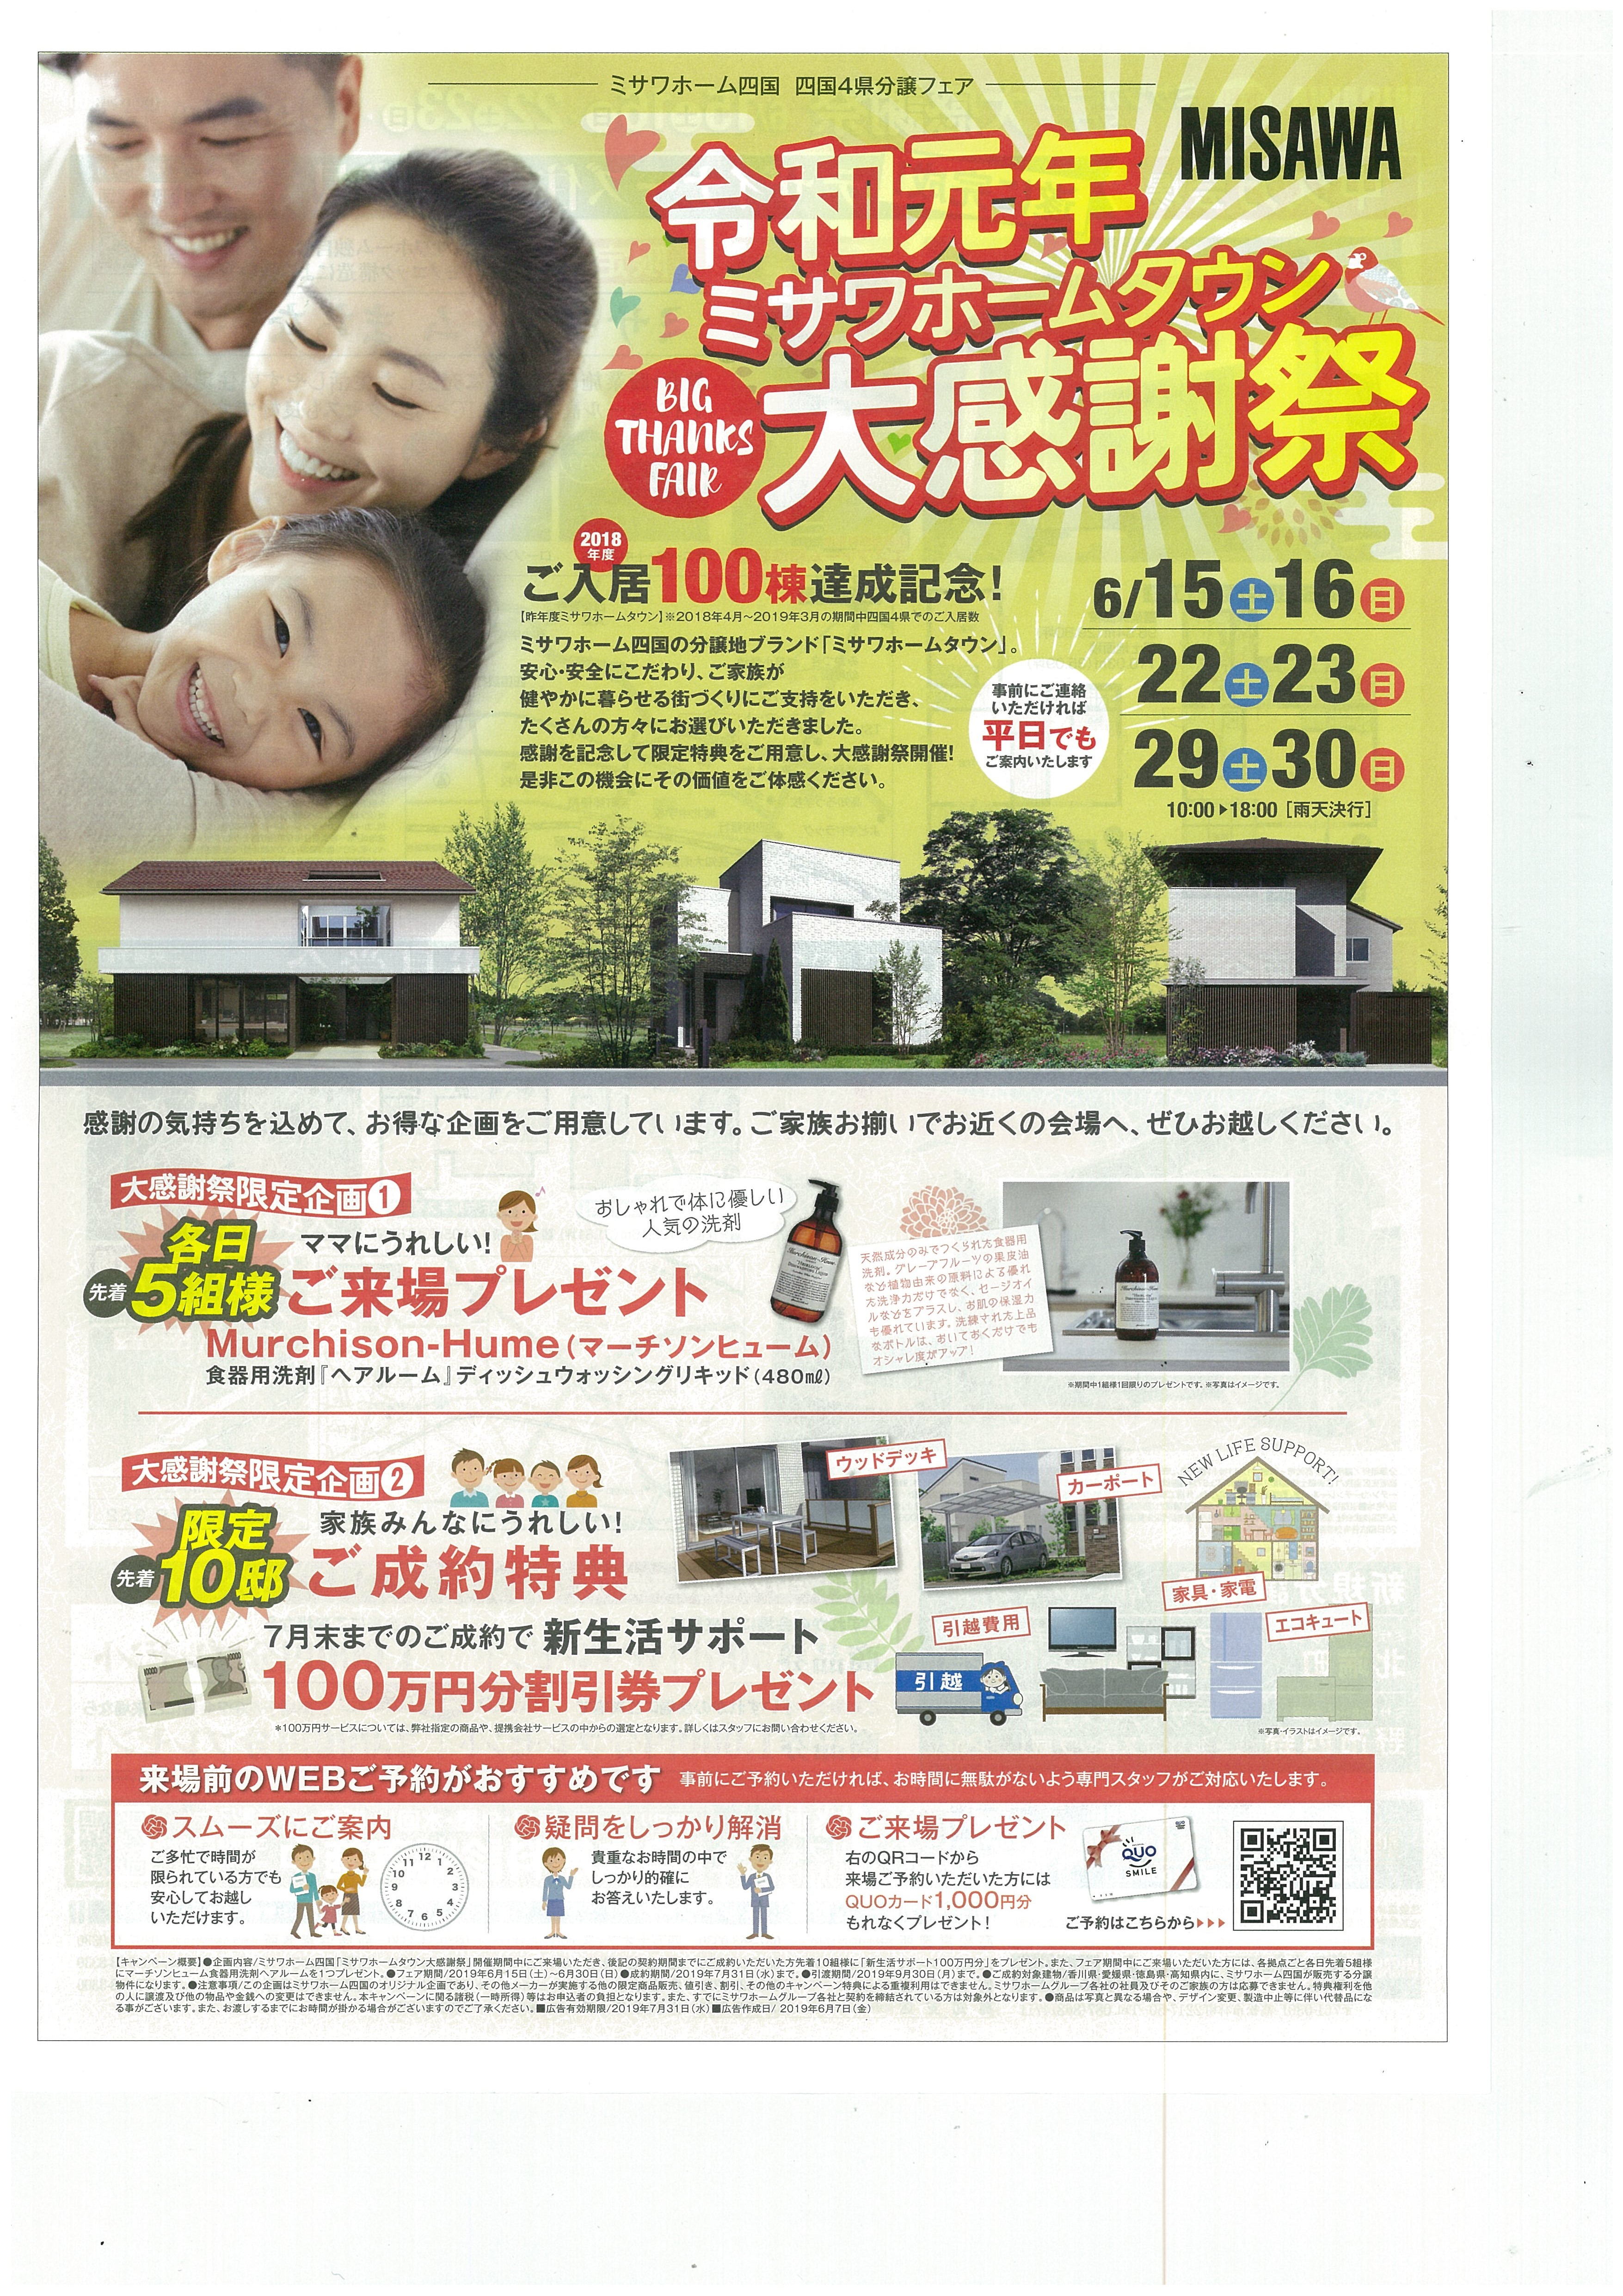 http://shikoku.misawa.co.jp/area_kouchi/files/20190613204540.jpg